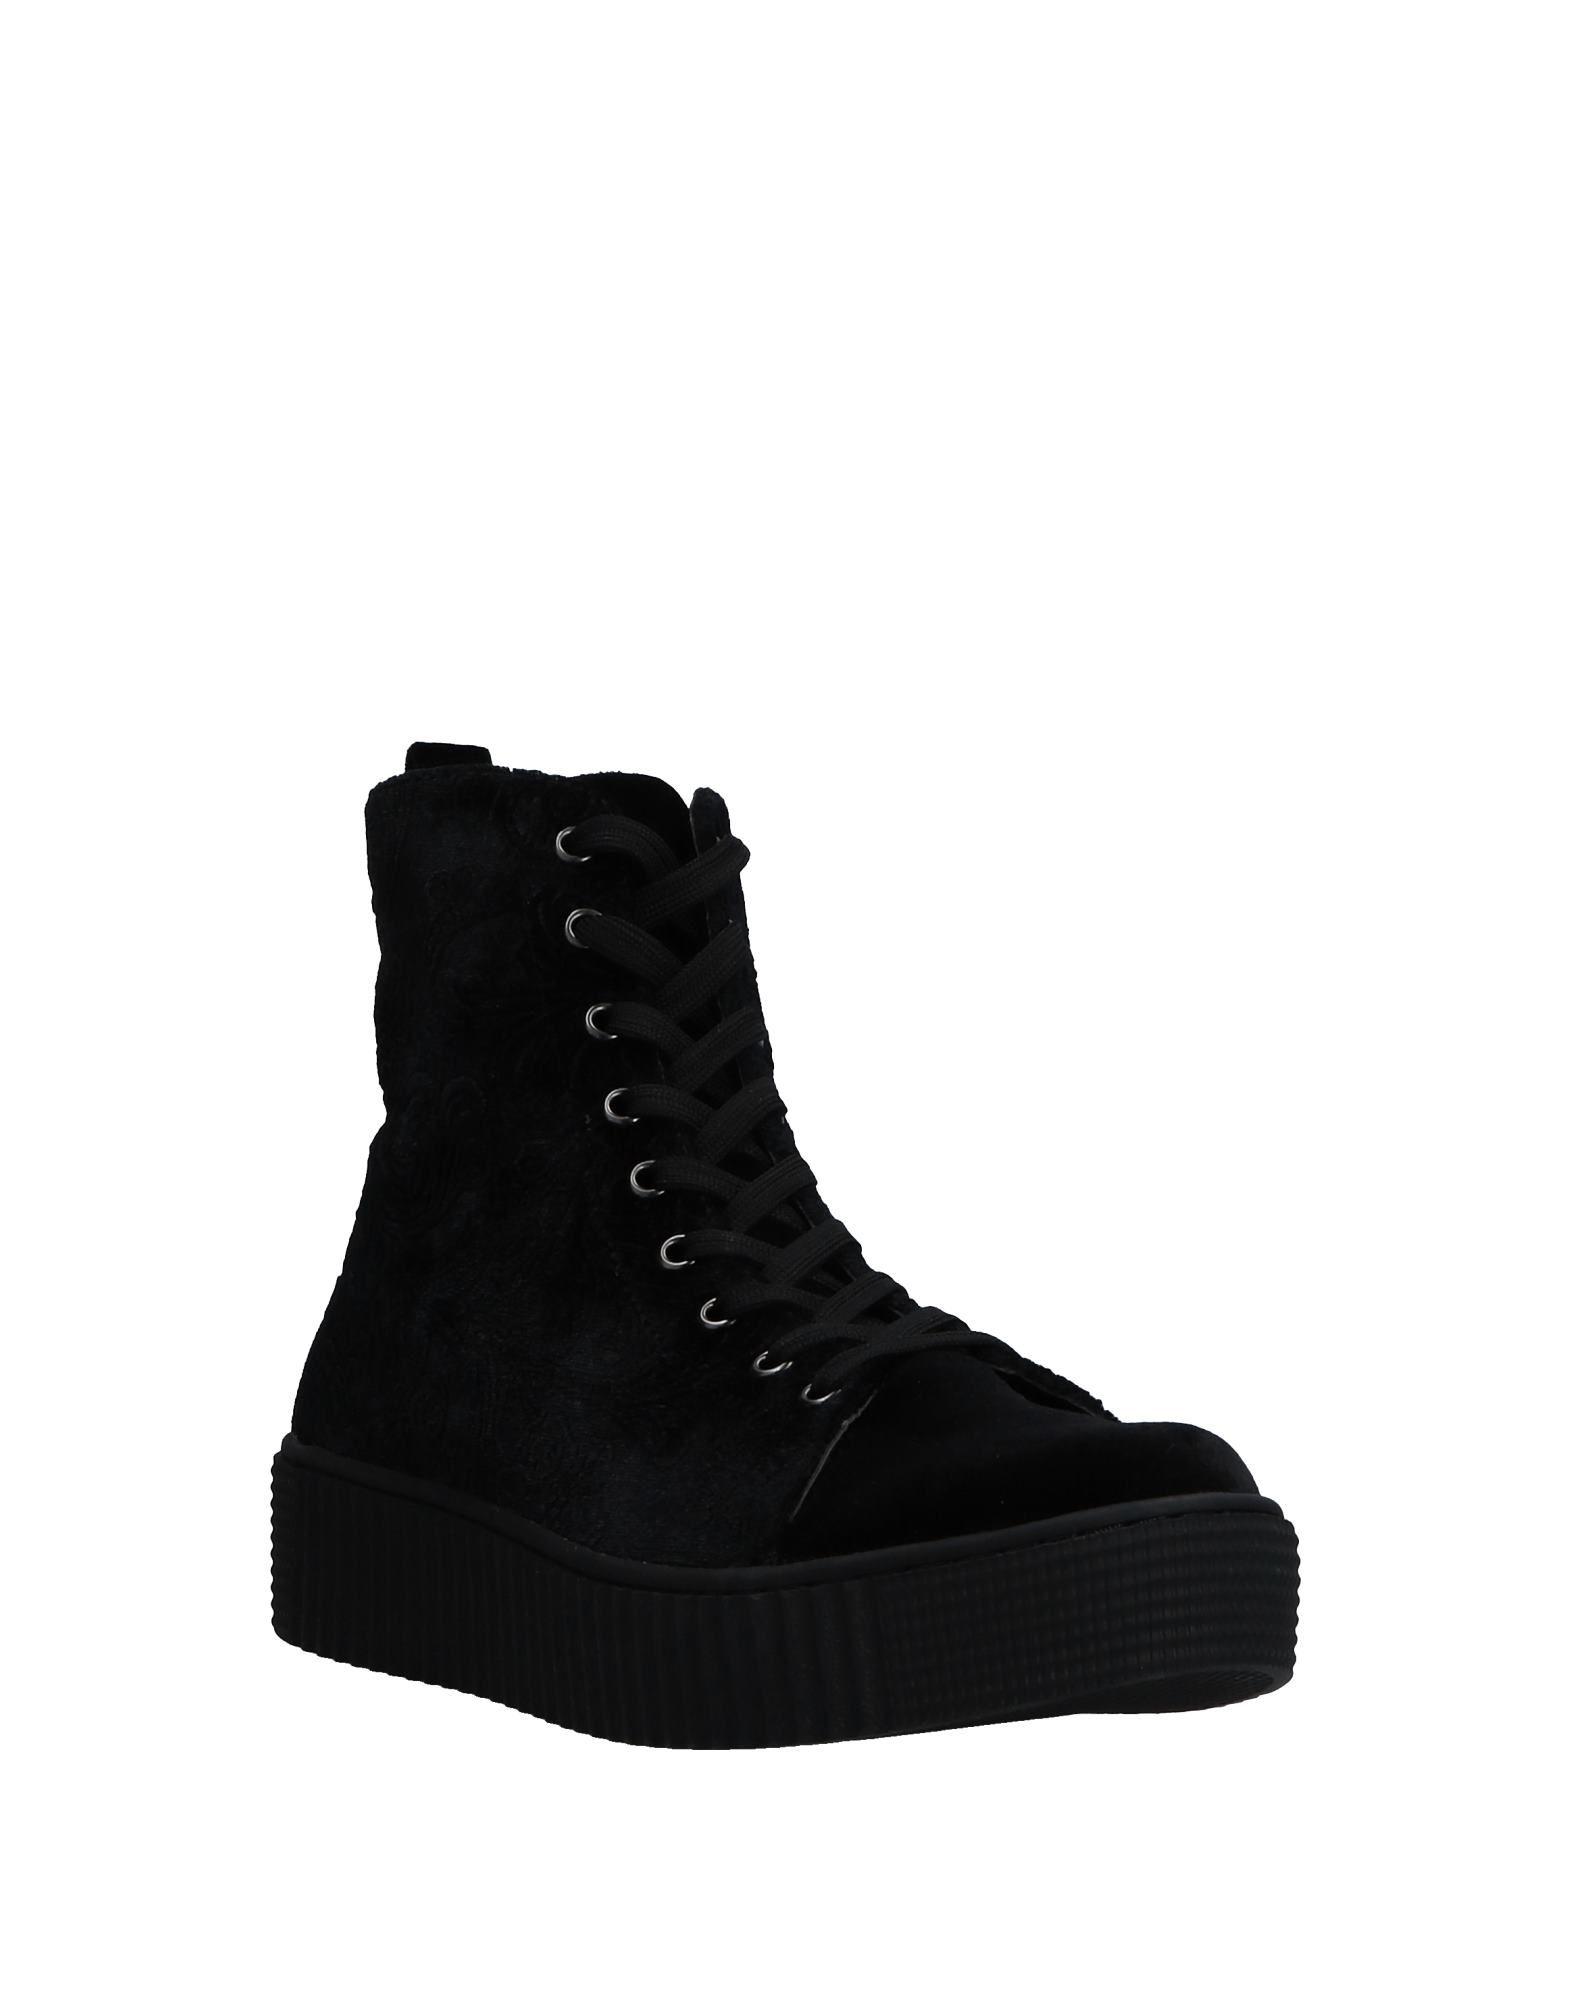 Onako' Sneakers Damen  beliebte 11526940HV Gute Qualität beliebte  Schuhe c518da